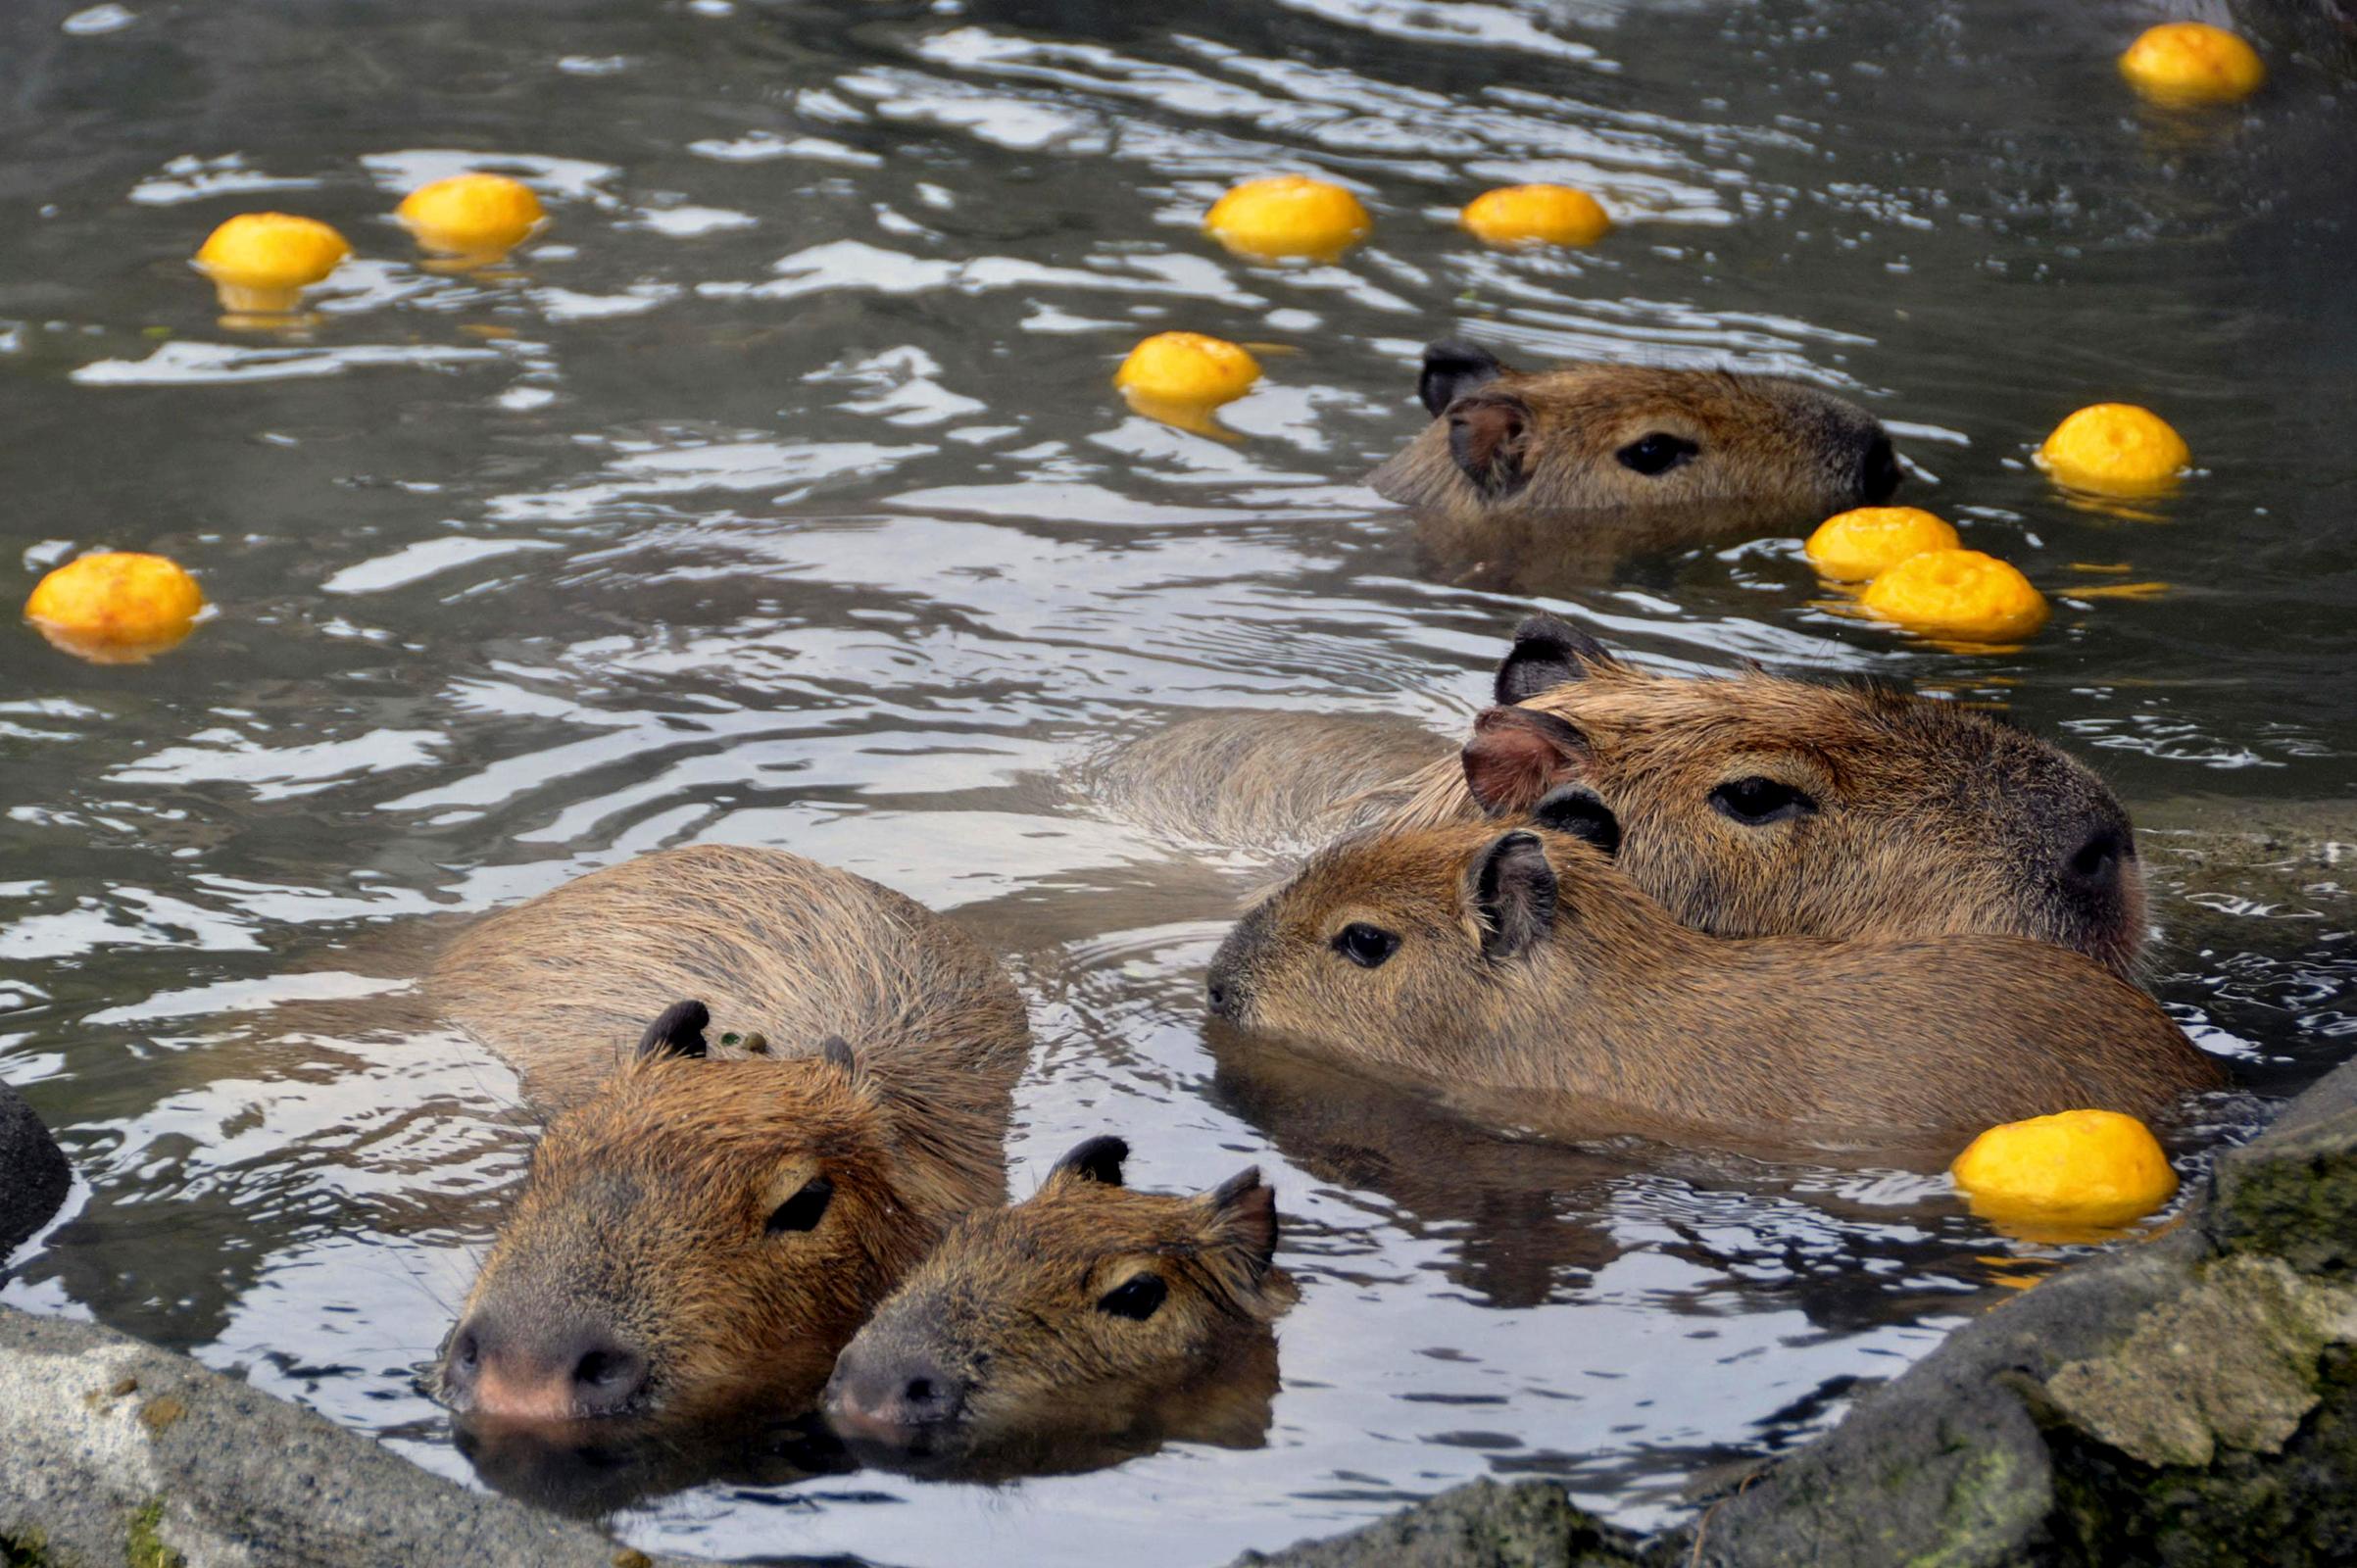 A pair of adult capybara and three babies take a yuzu-yu, or a hot bath with yuzu citrus fruits, a winter solstice ritual in Japan.